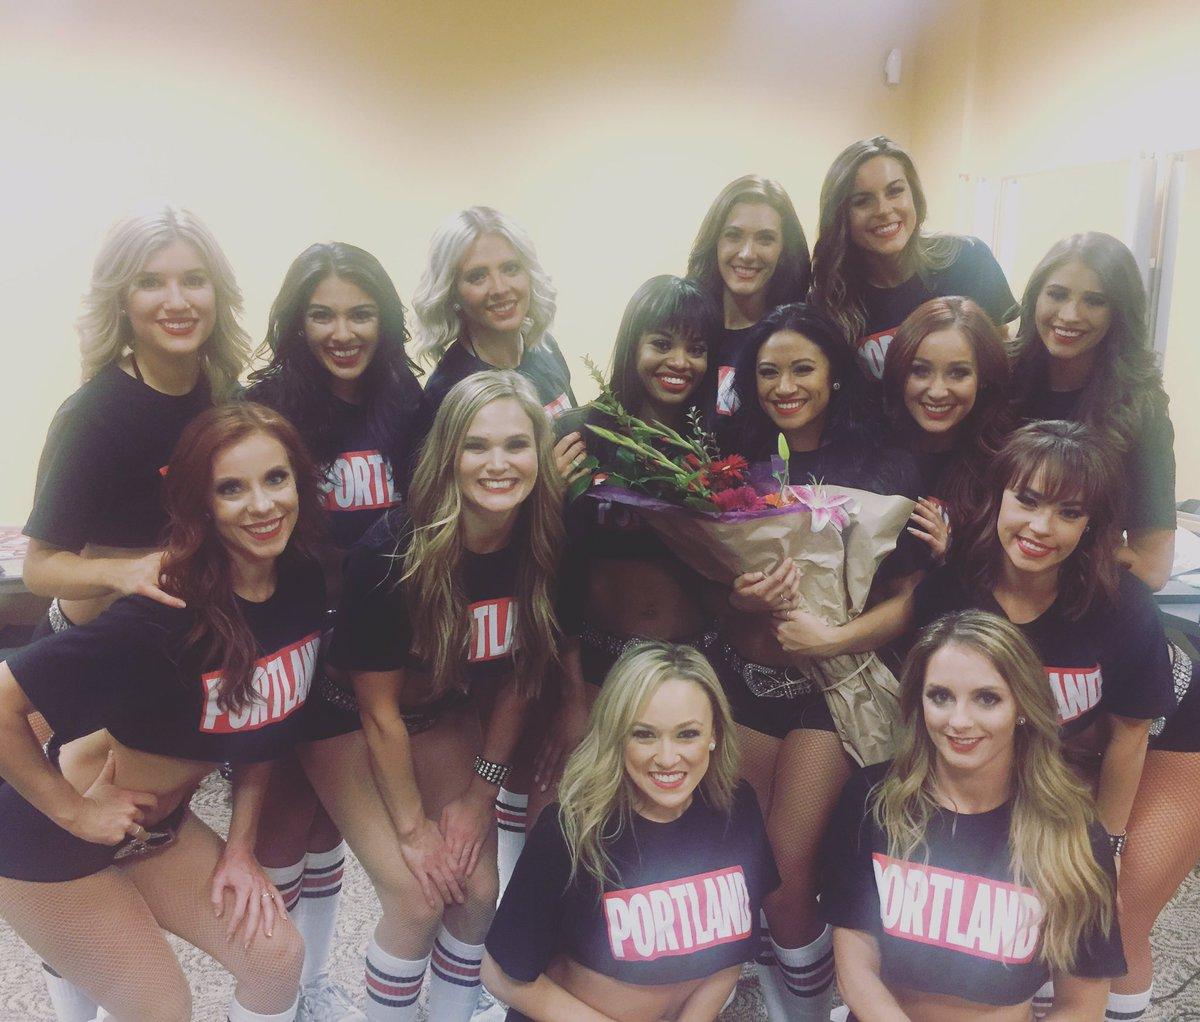 2017 Nba All Star Dance Team Portland Blazerdancer Candice